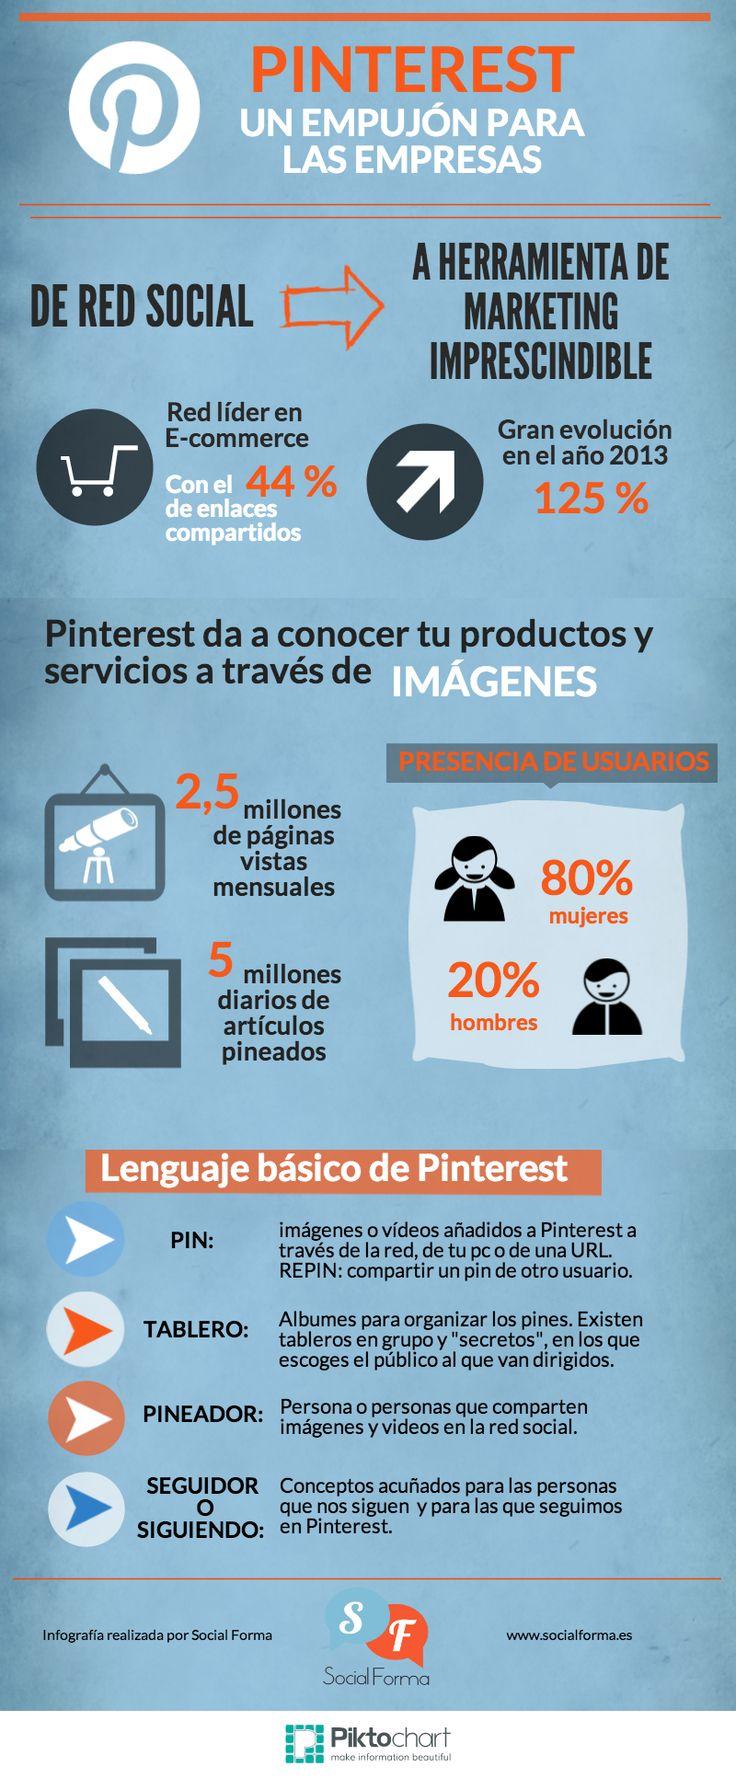 708 best infograf as sobre redes sociales en espa ol for Pinterest en espanol